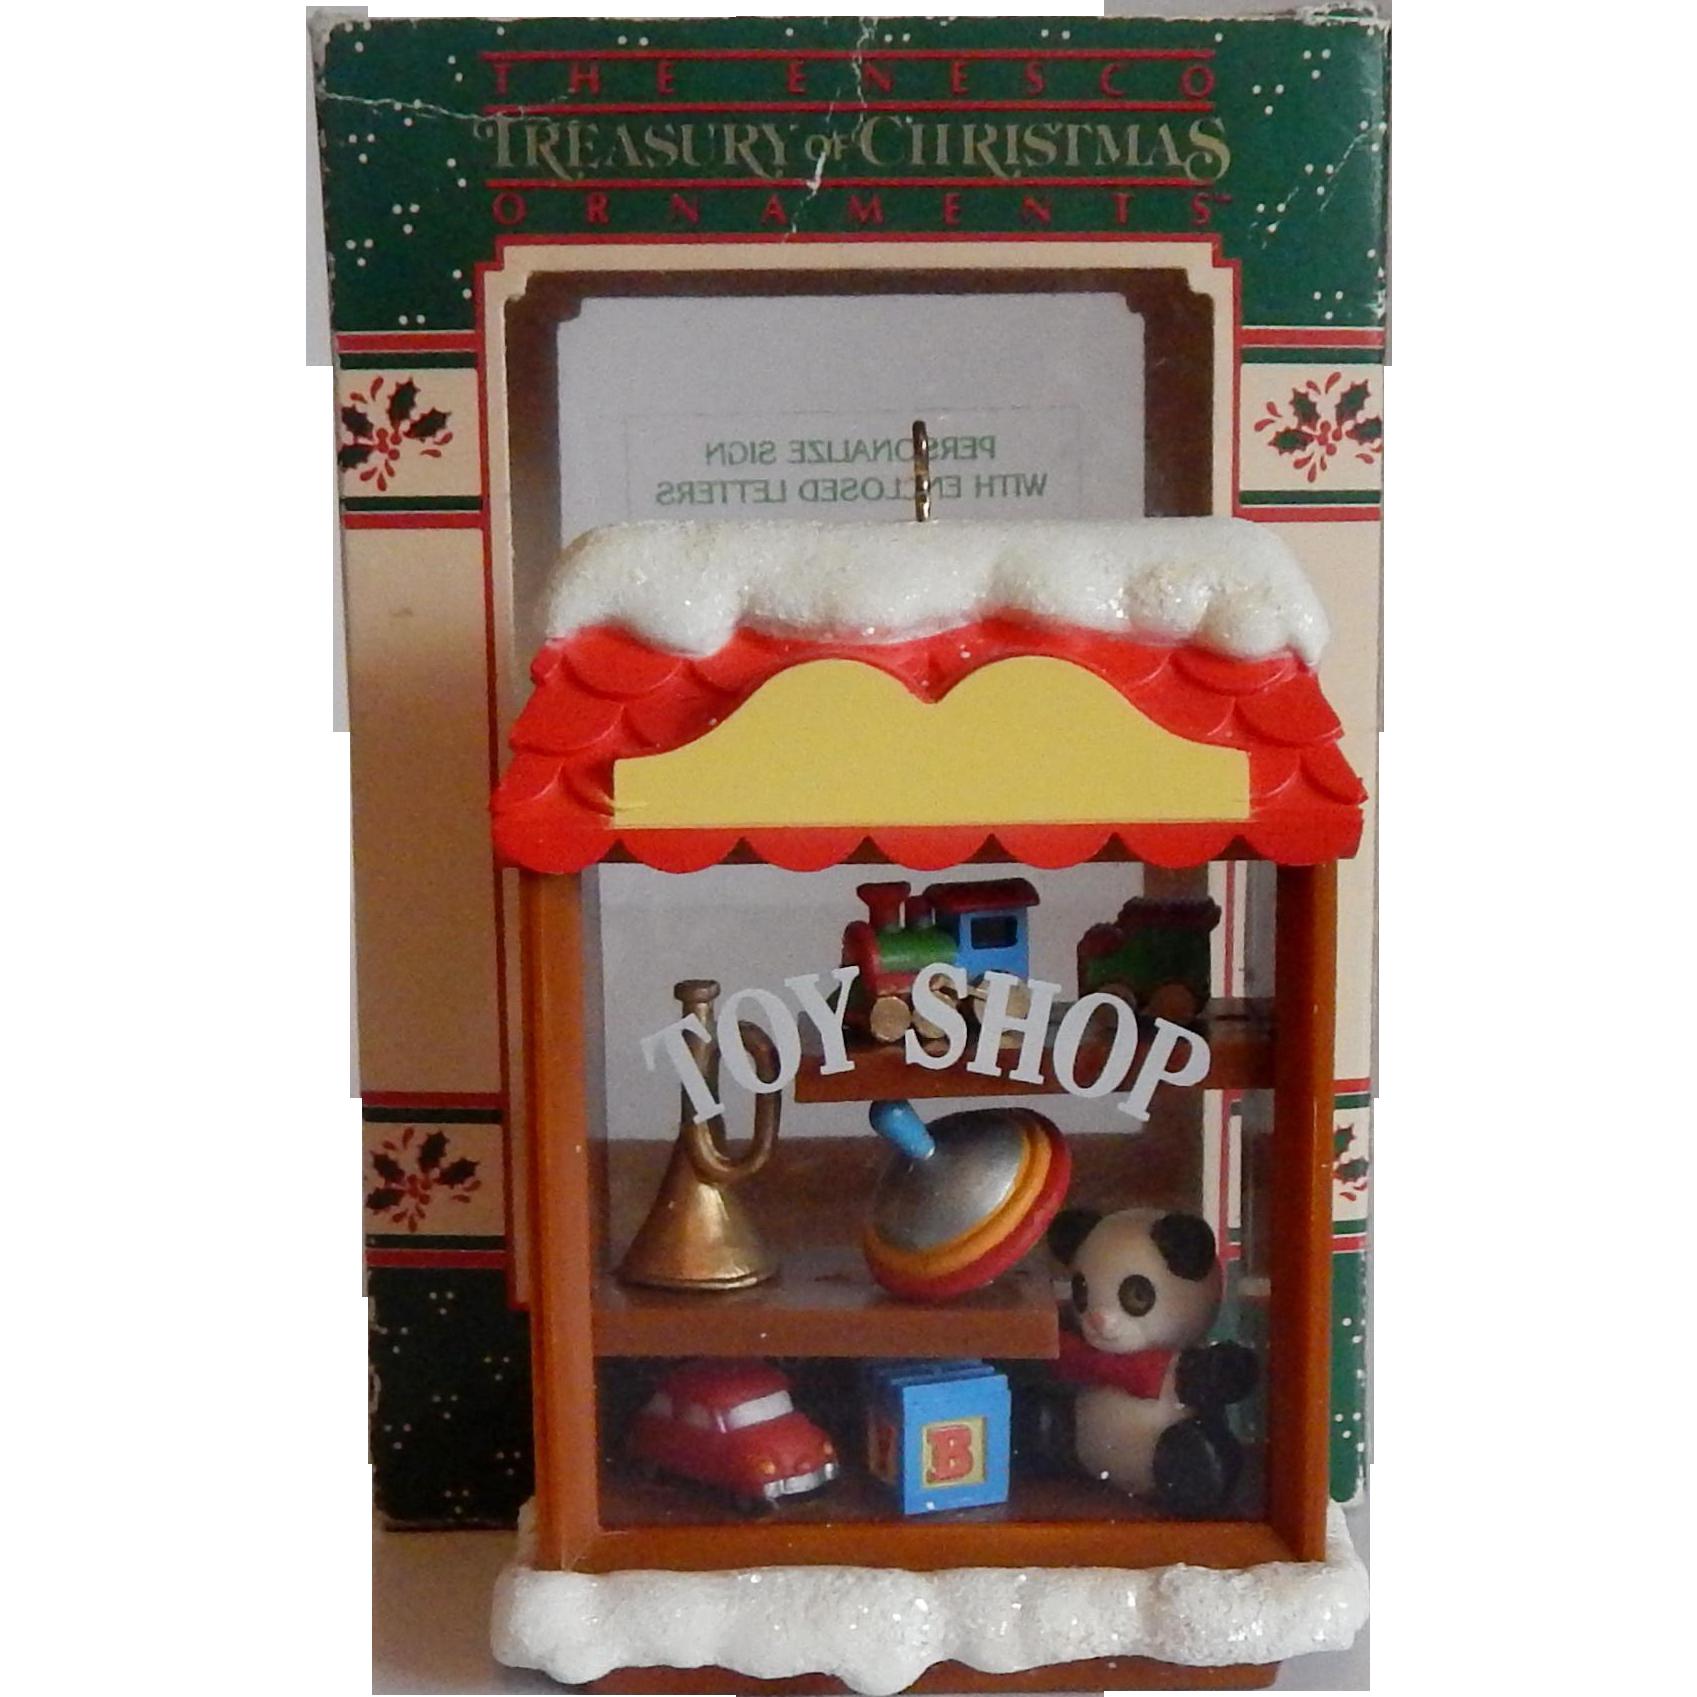 Enesco 1983 Toy Shop Christmas Ornament